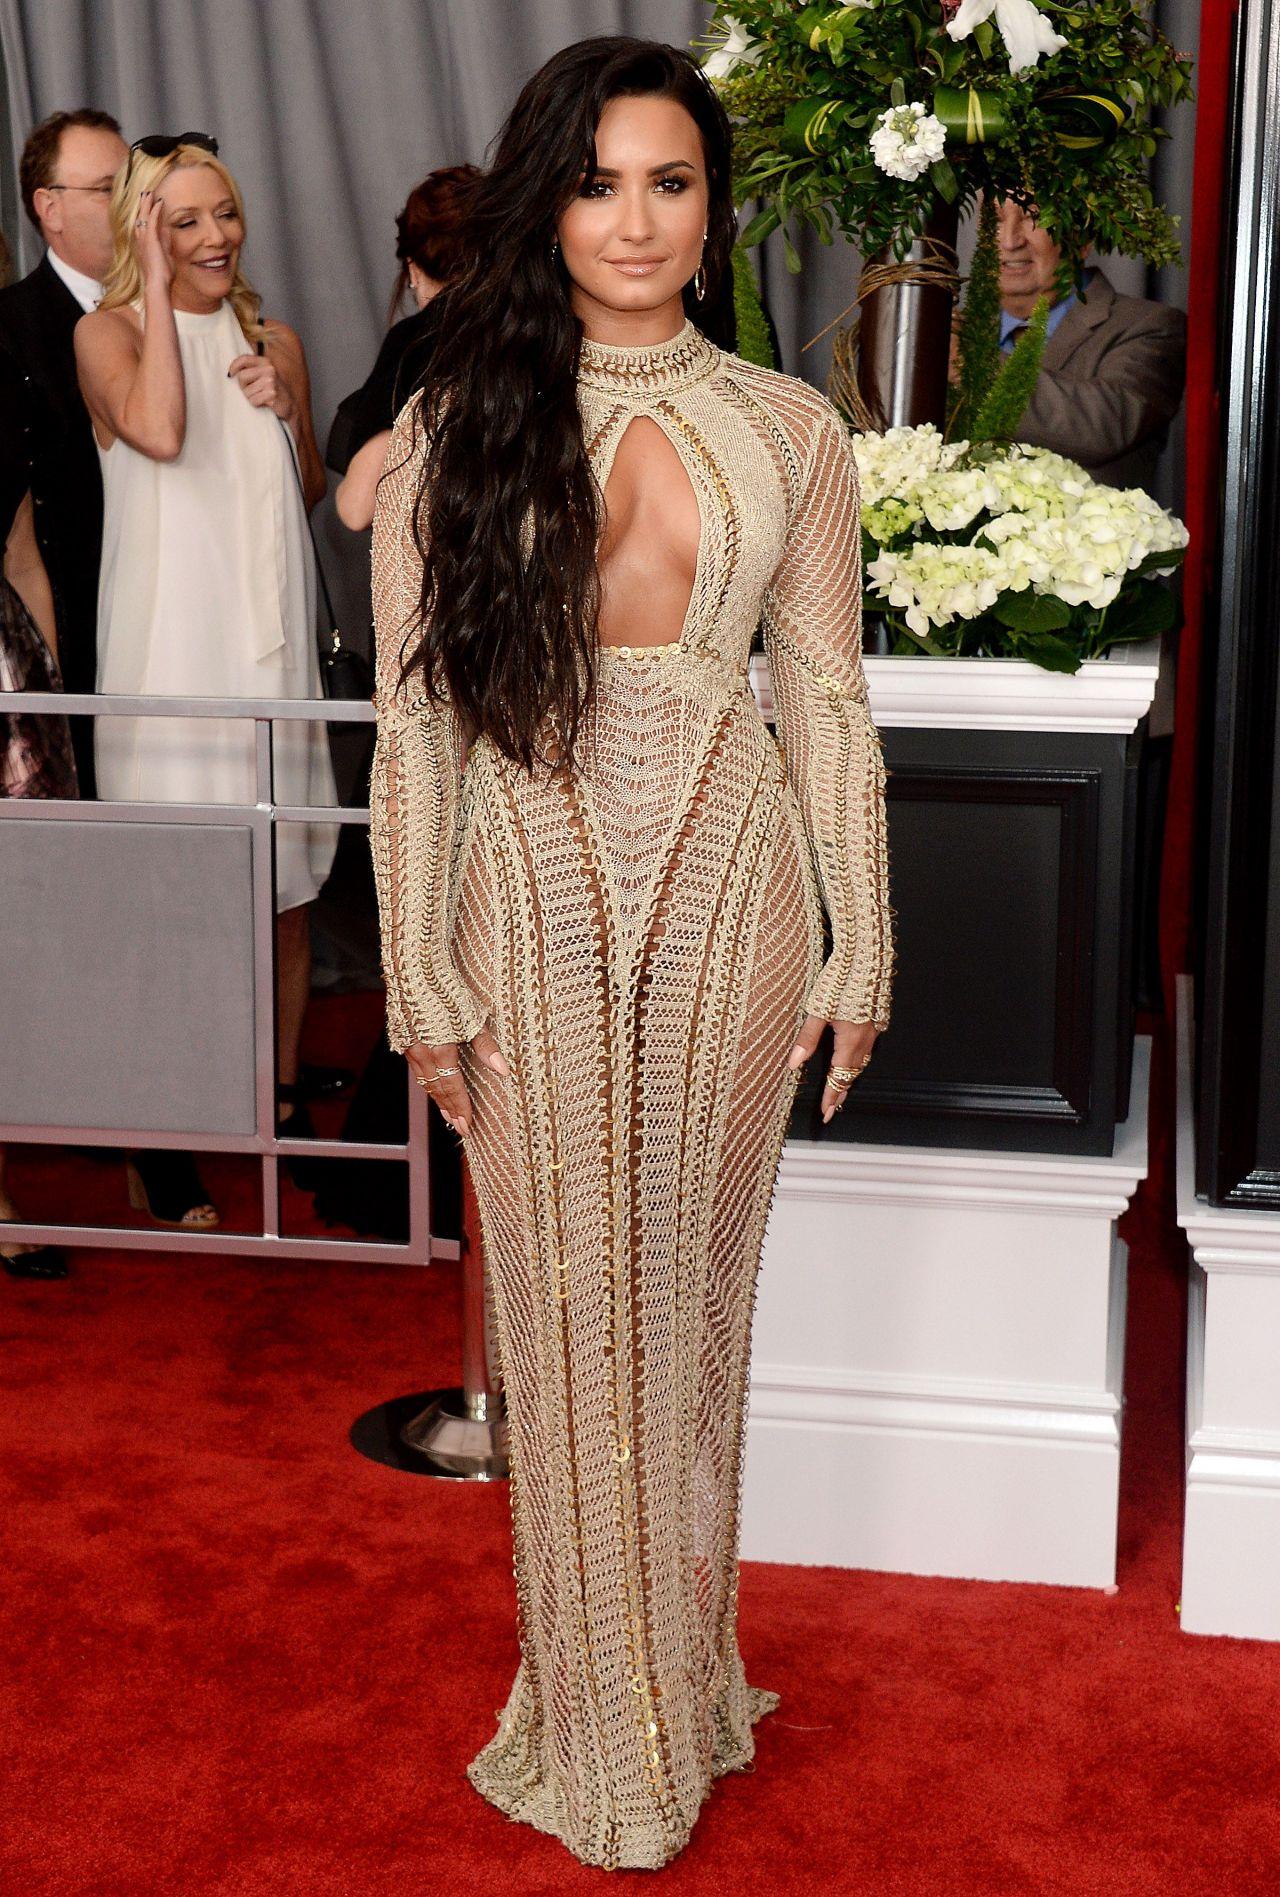 Rihanna on Red Carpet - GRAMMY Awards in Los Angeles 2/12